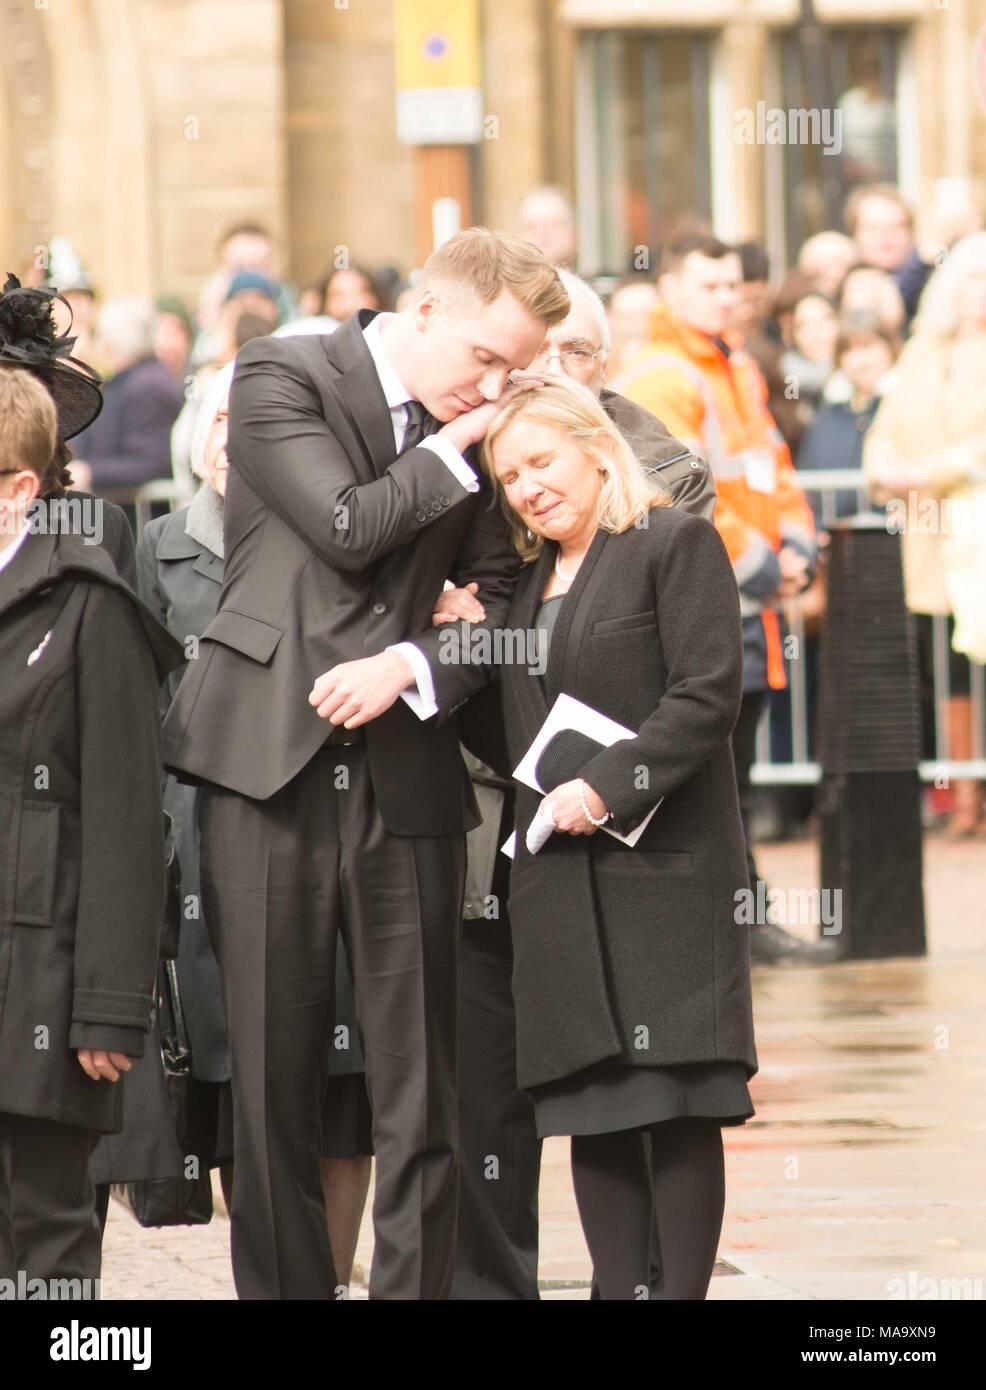 Cambridge, UK, 31 Mar 2018. Prof Stephen Hawking's family bid him farewell from Gt St Marys church Cambridge UK Credit: kevin Hodgson/Alamy Live News - Stock Image